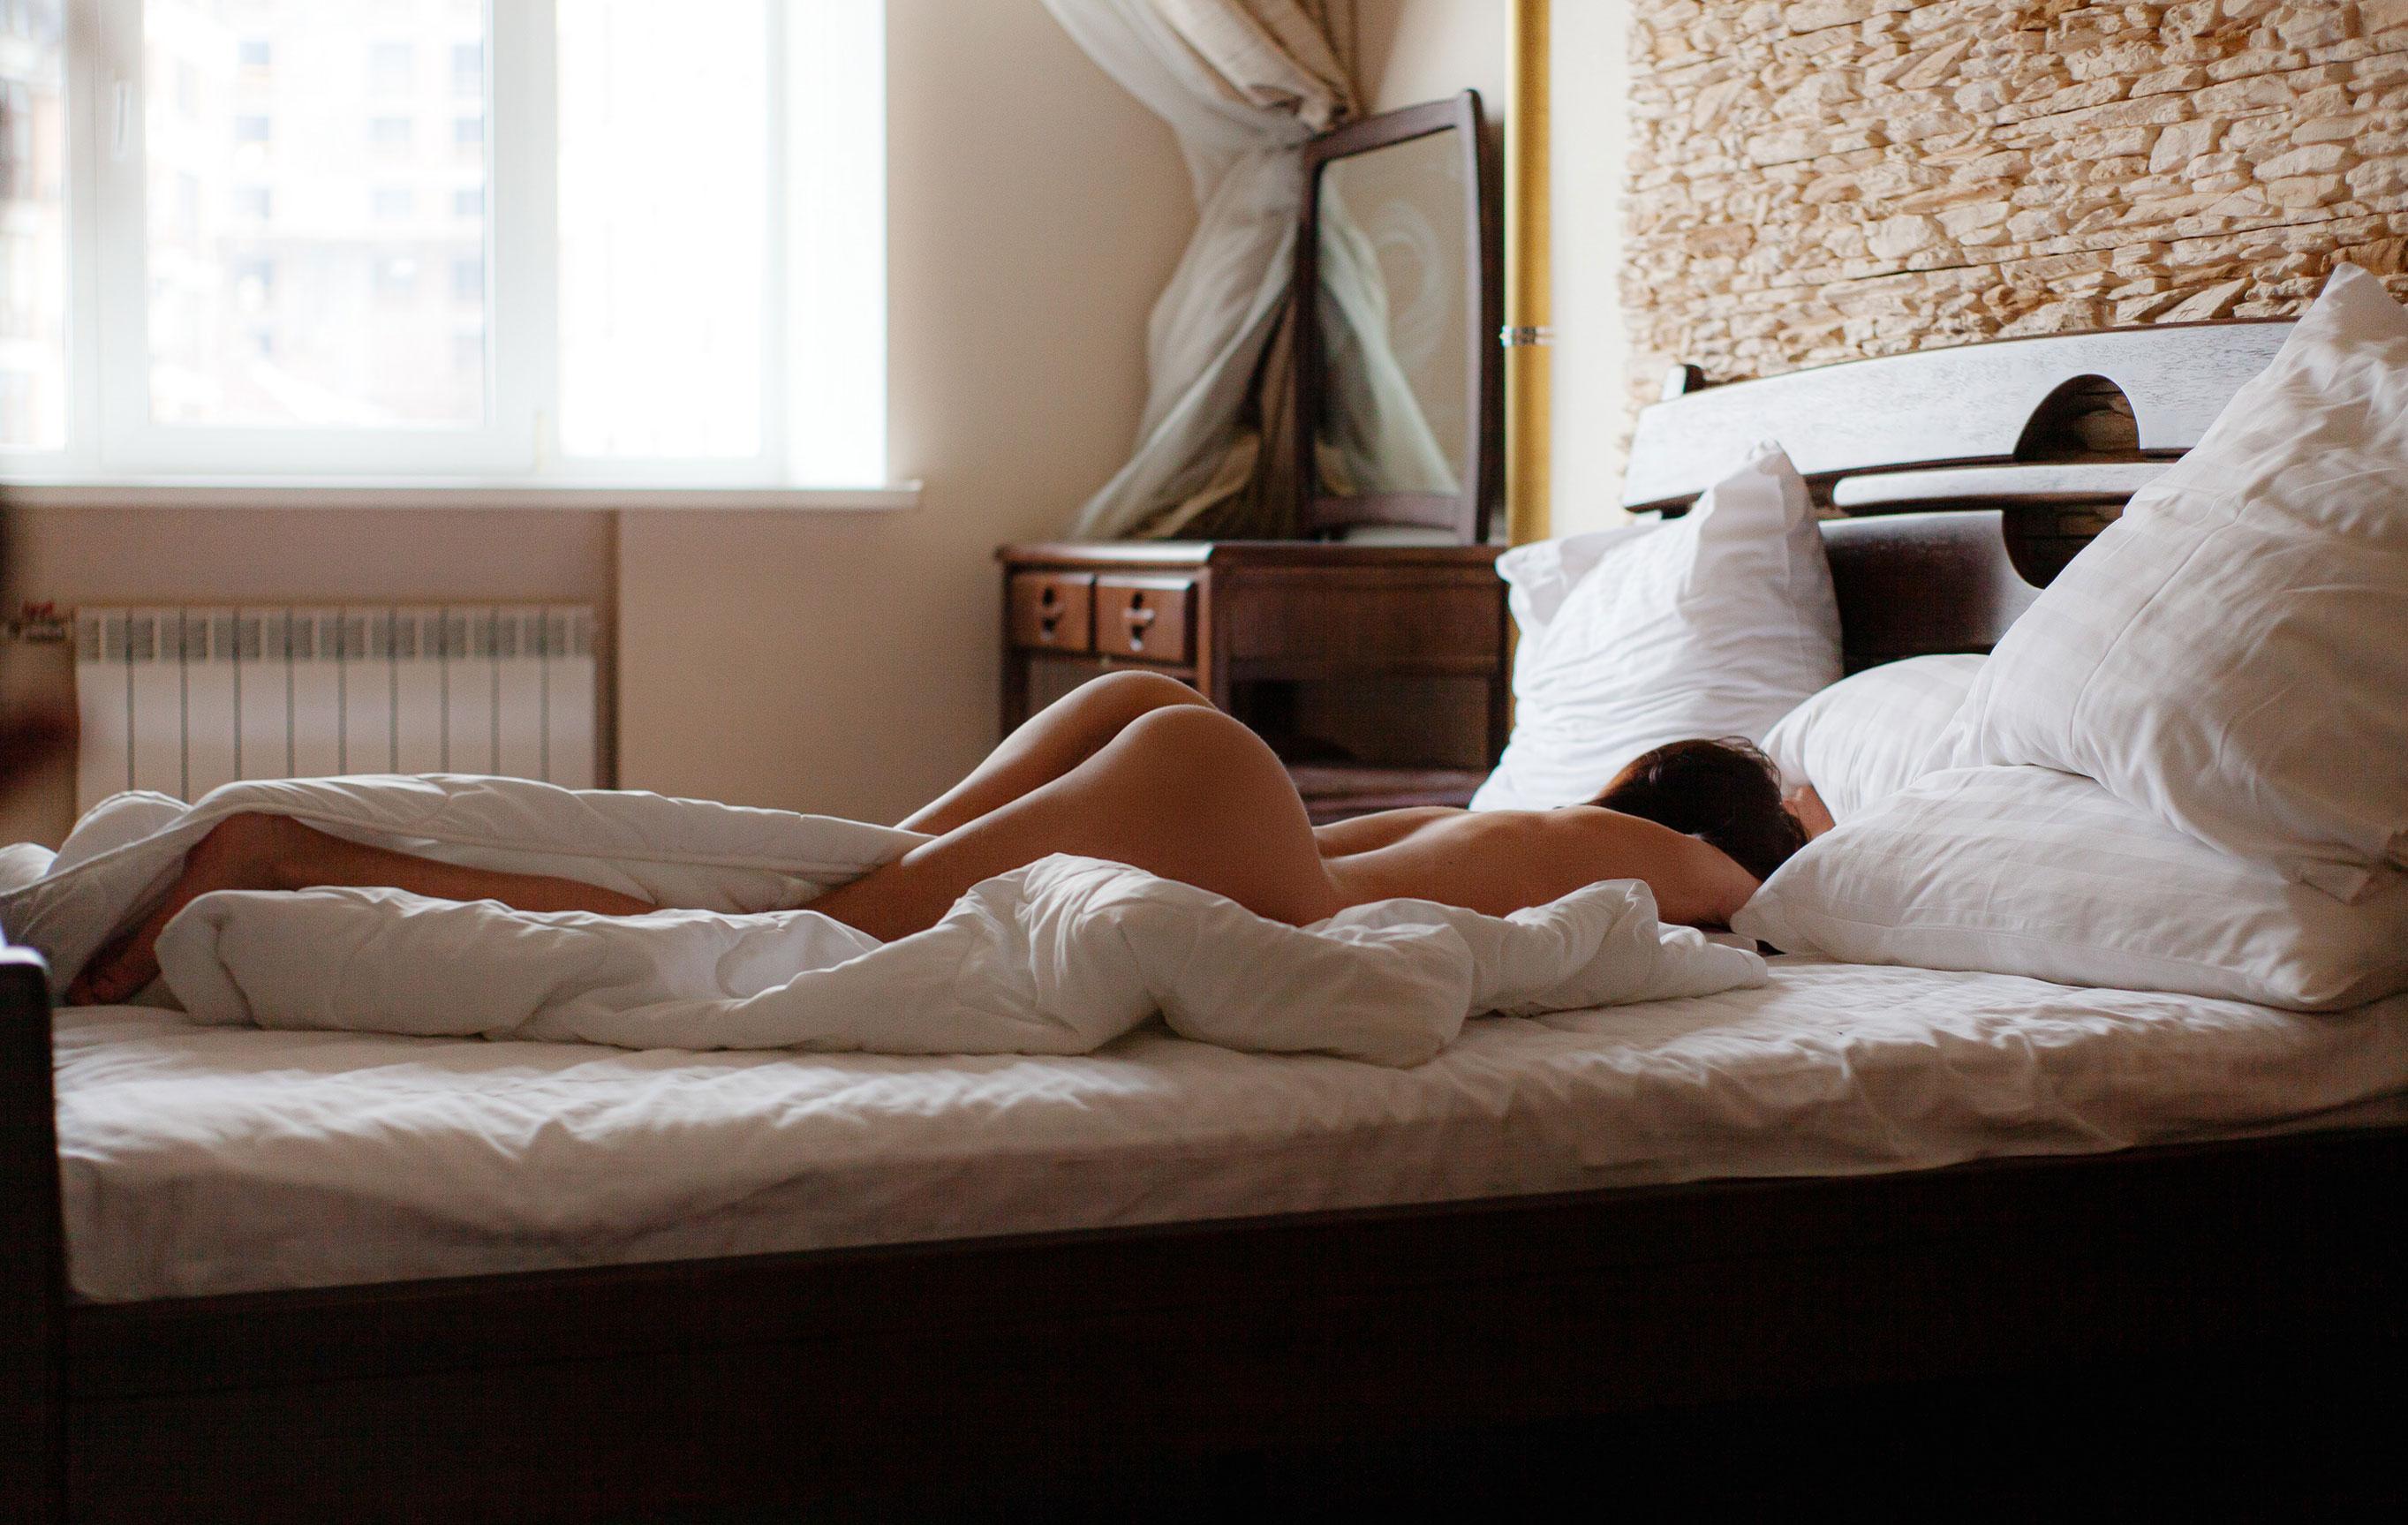 Сексуальная голая девушка на белых простынях / фото 01